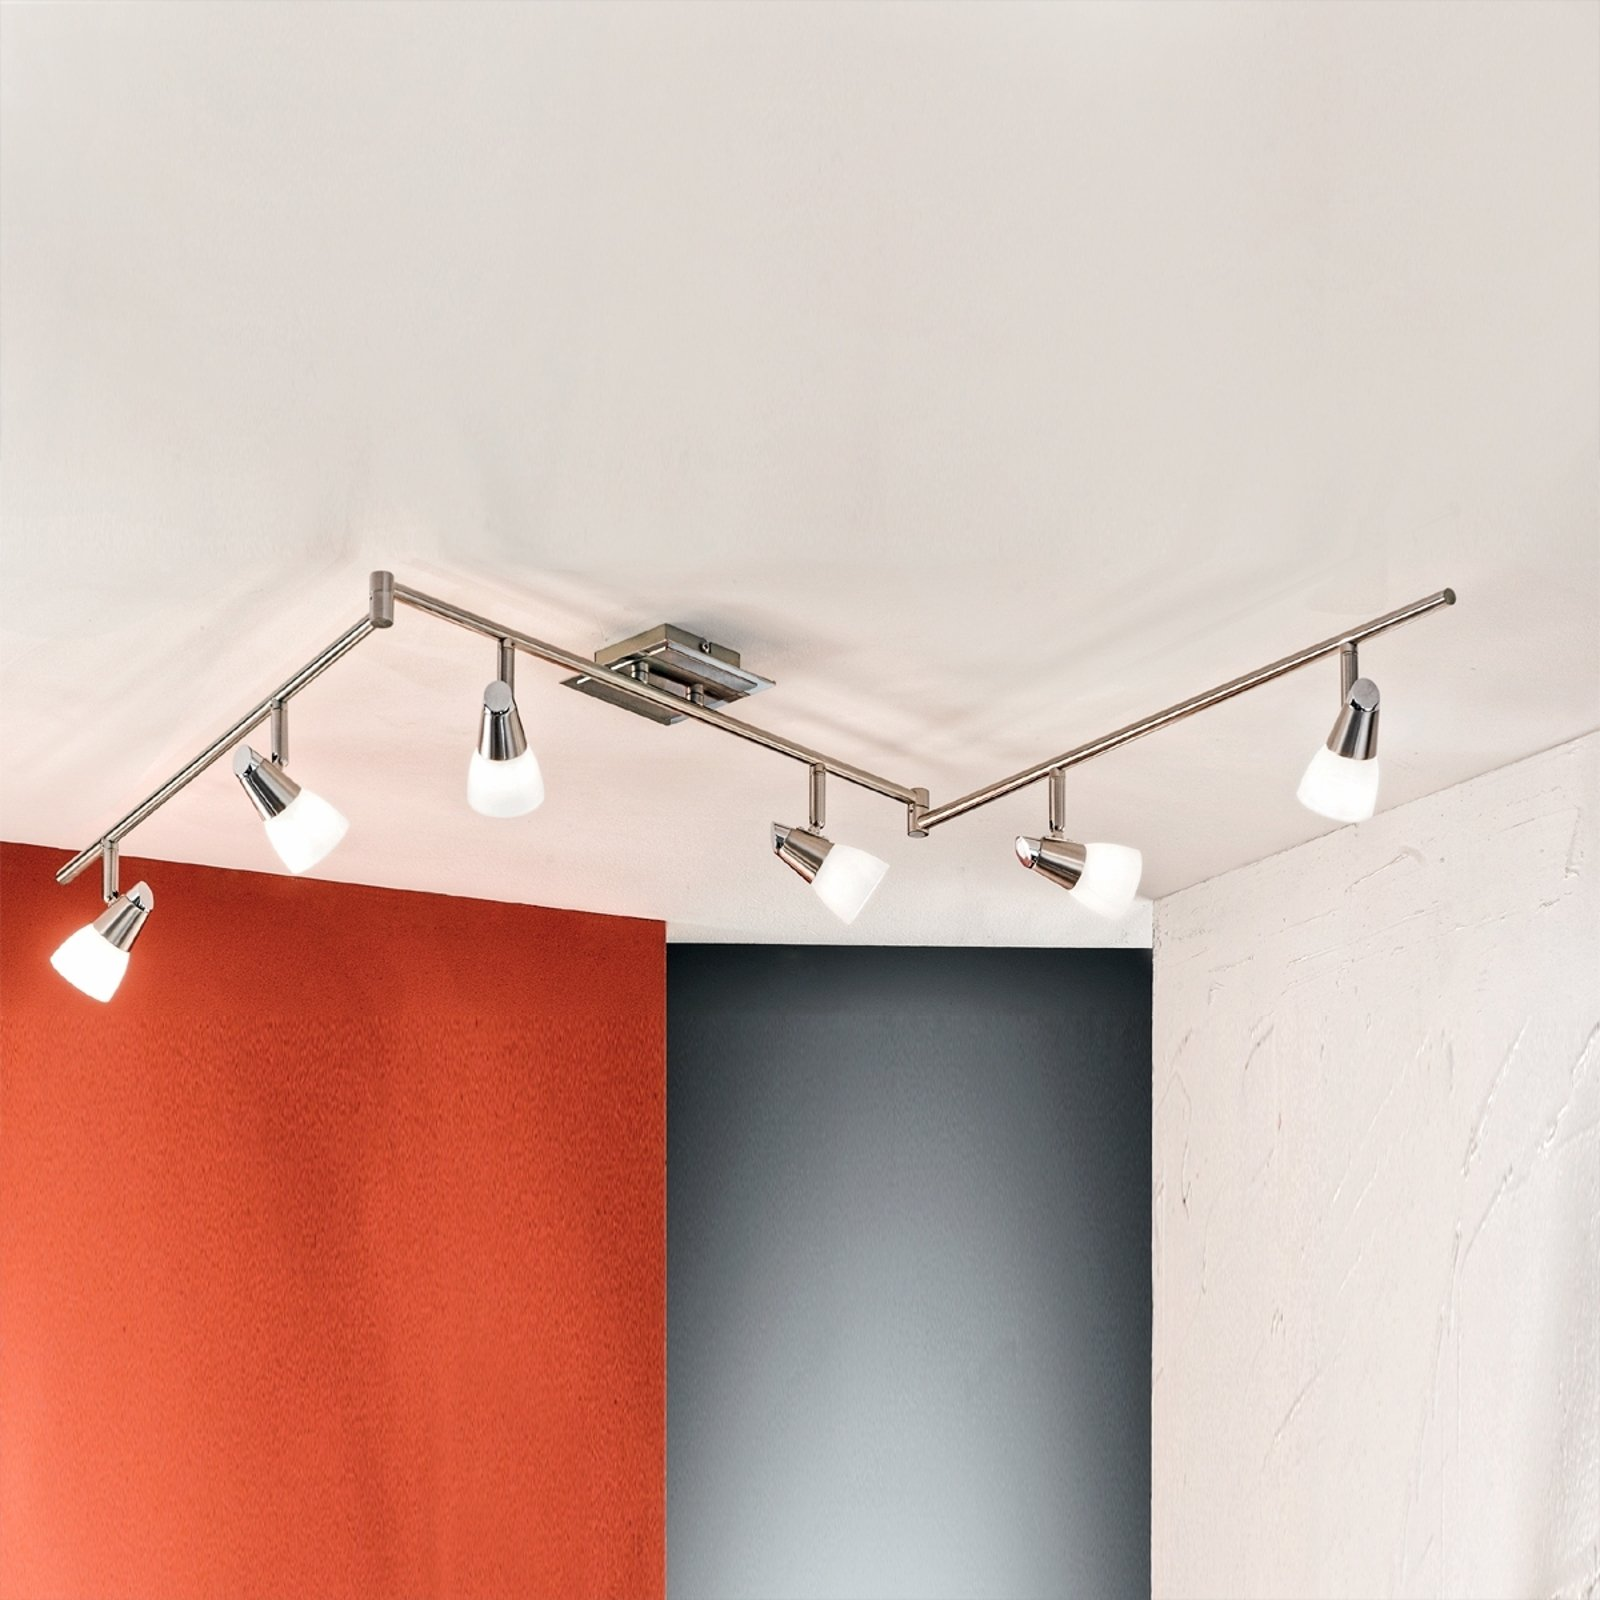 Fleksibel MIRTEL taklampe med seks lys